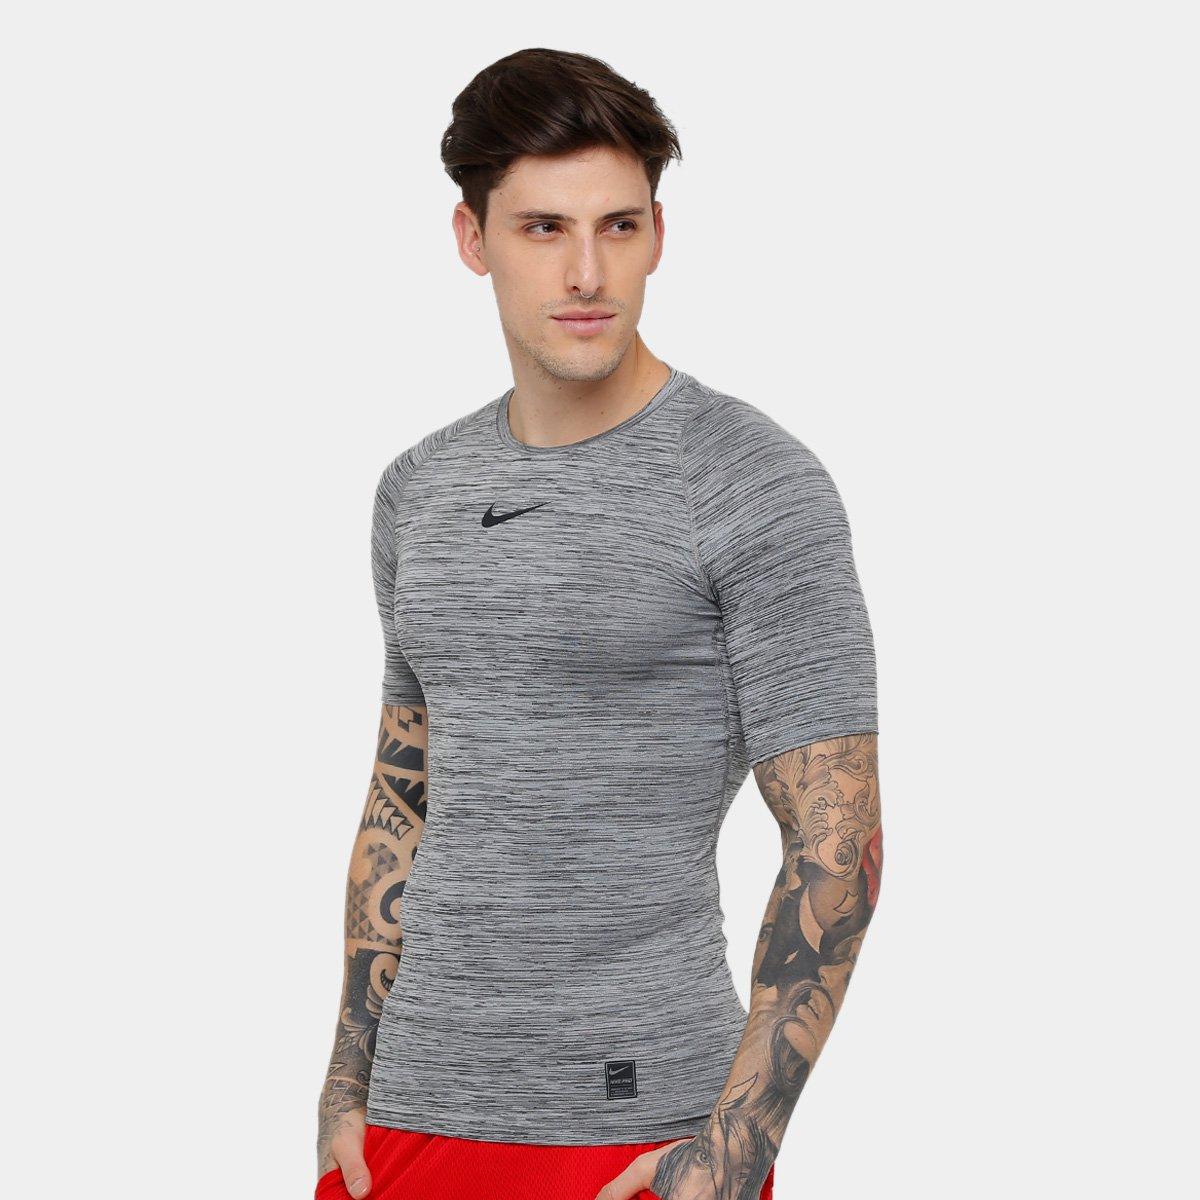 9a9c0d623c Camiseta Compressão Nike Pro Masculina